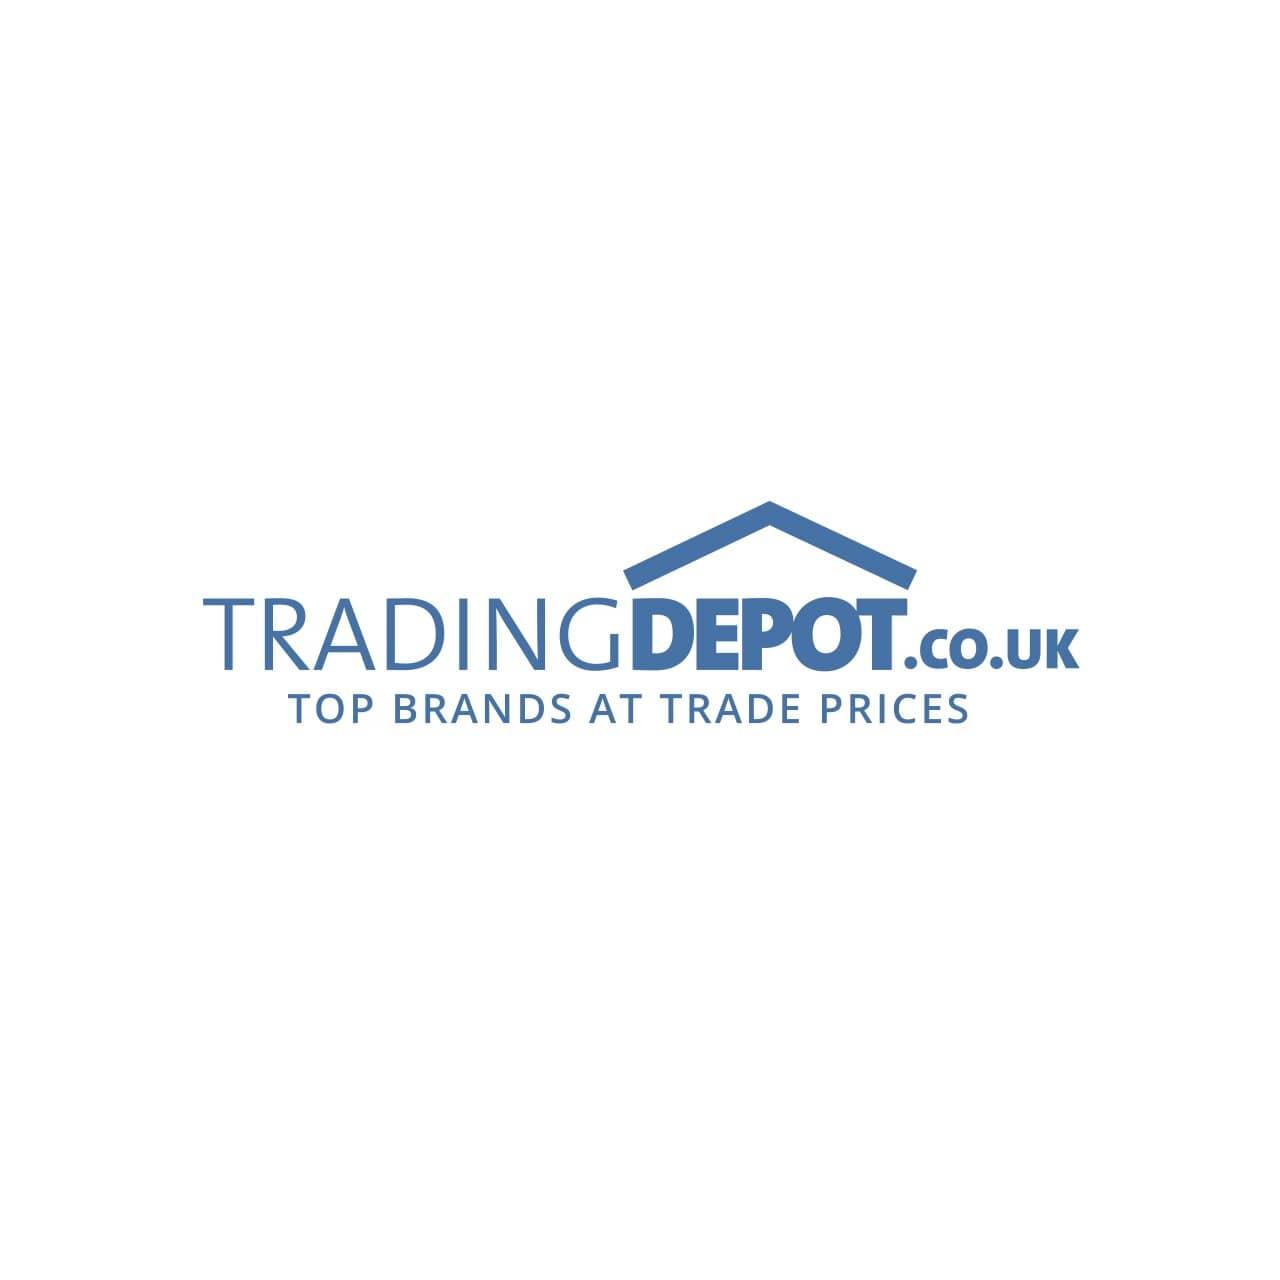 Velux Integra Electric Roof Window - Triple Glazed with Anti-Dew & Easy to Clean Glazing – White Painted 134 x 98cm - GGL UK04 206621U